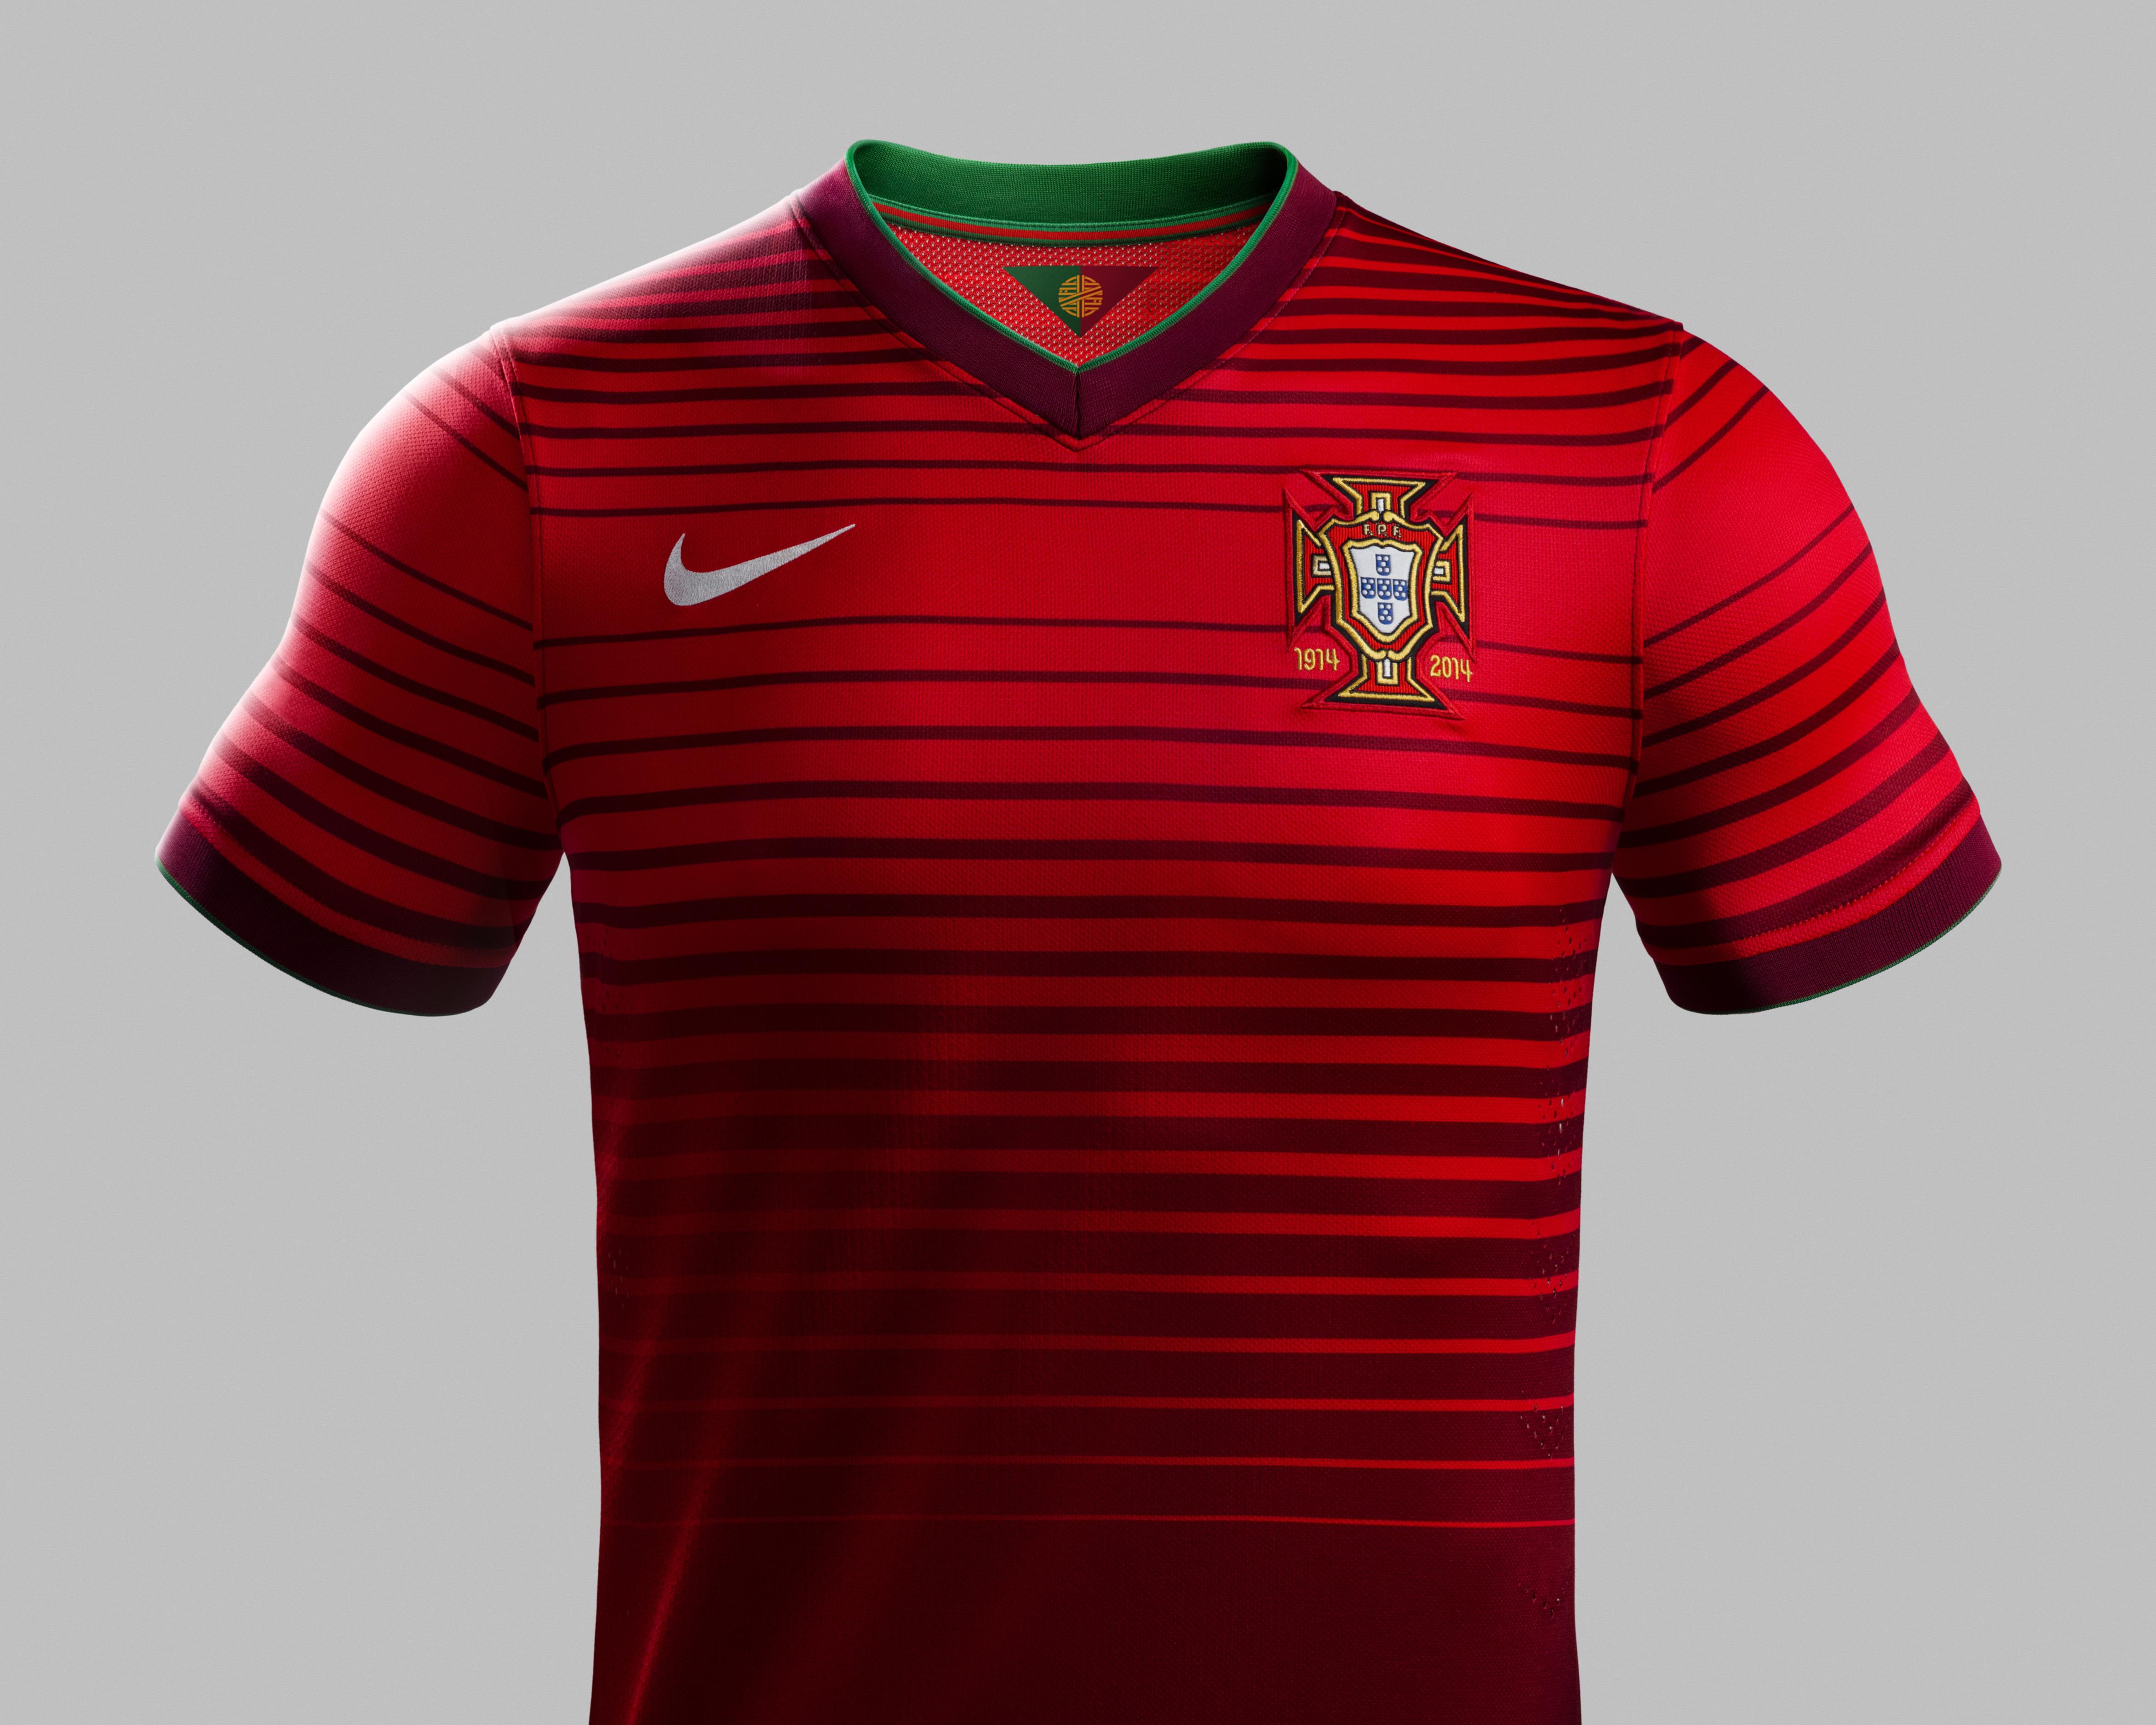 9ba908707 2014 world cup portugal 7 ronaldo home soccer shirt kit ...